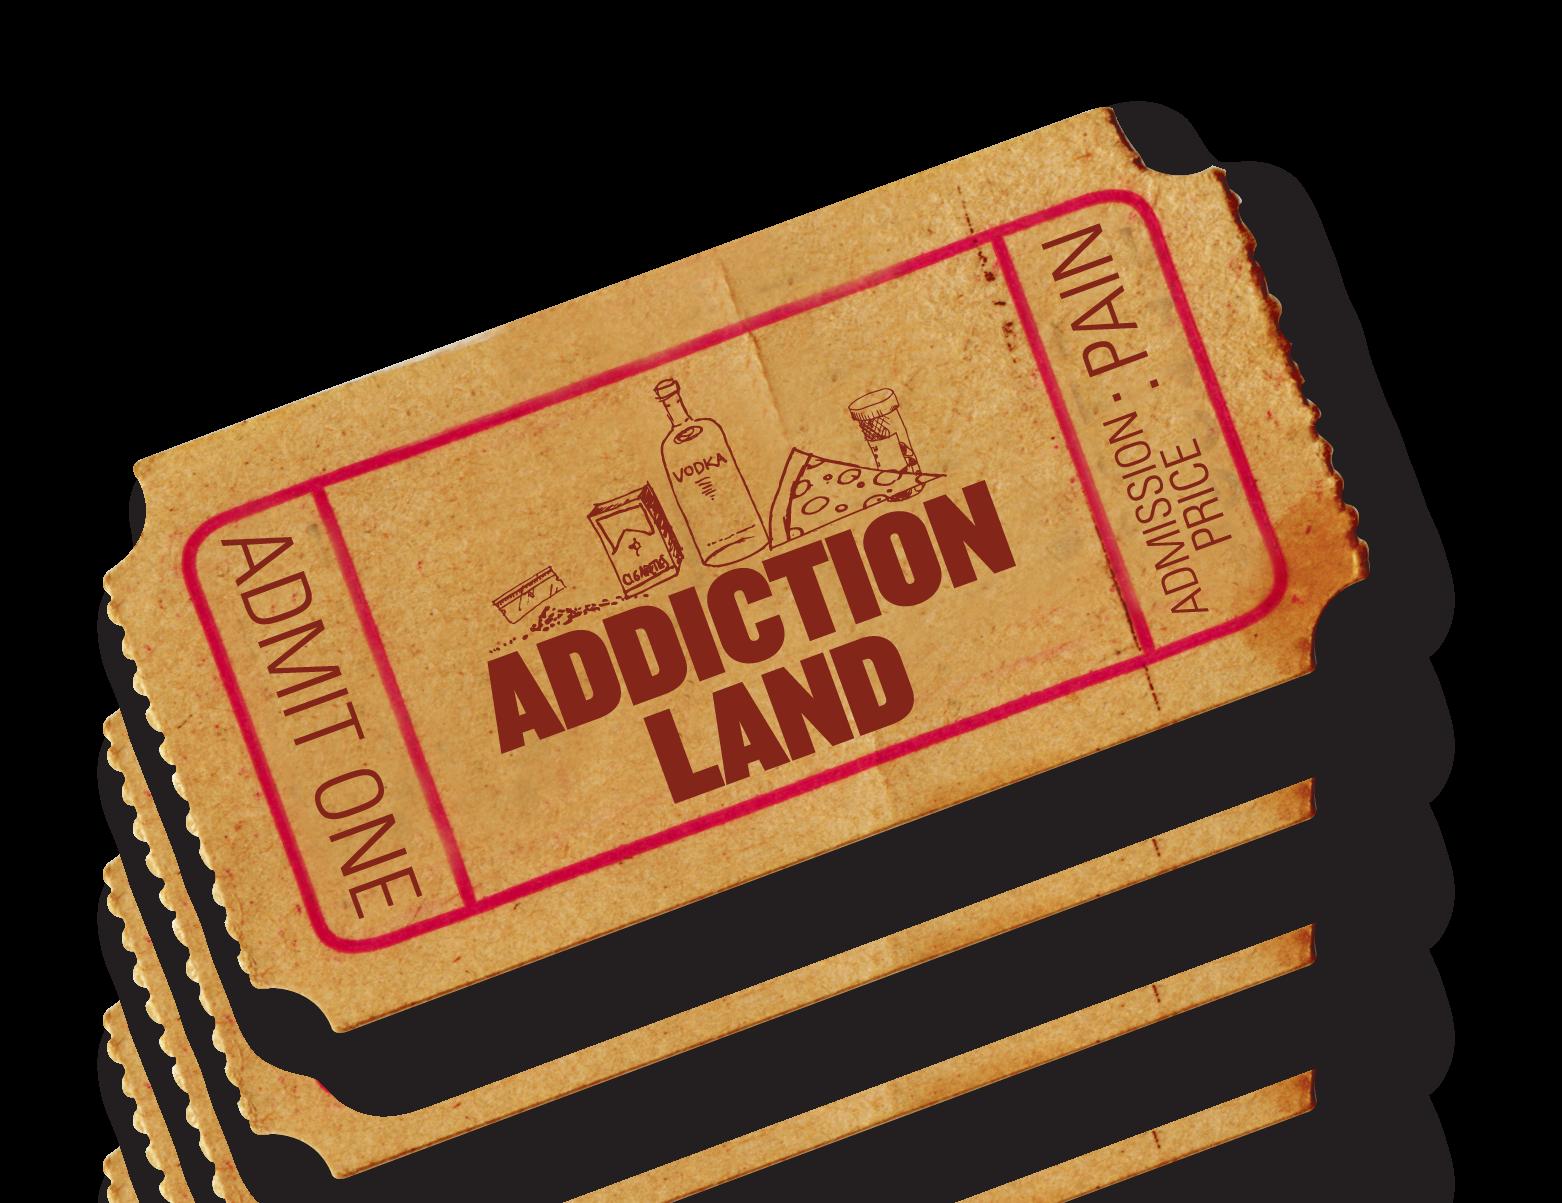 addictionland